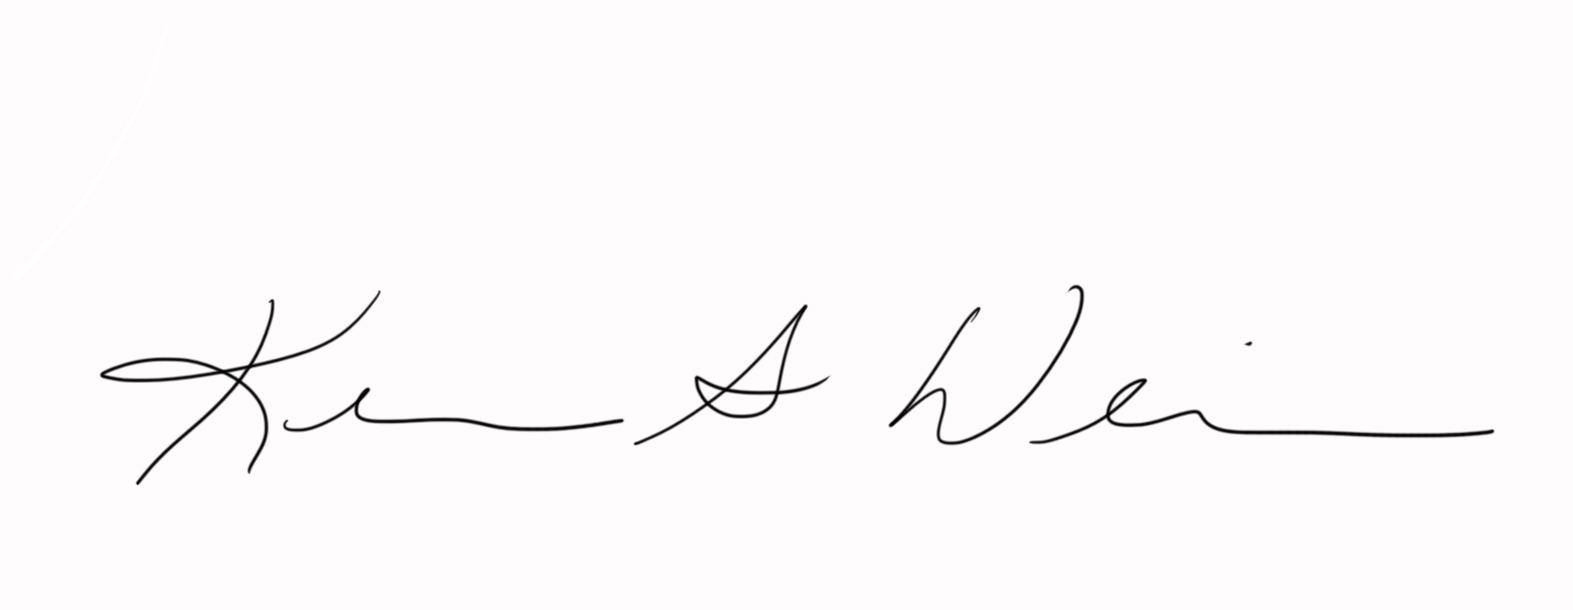 Kerri Weiss's Signature